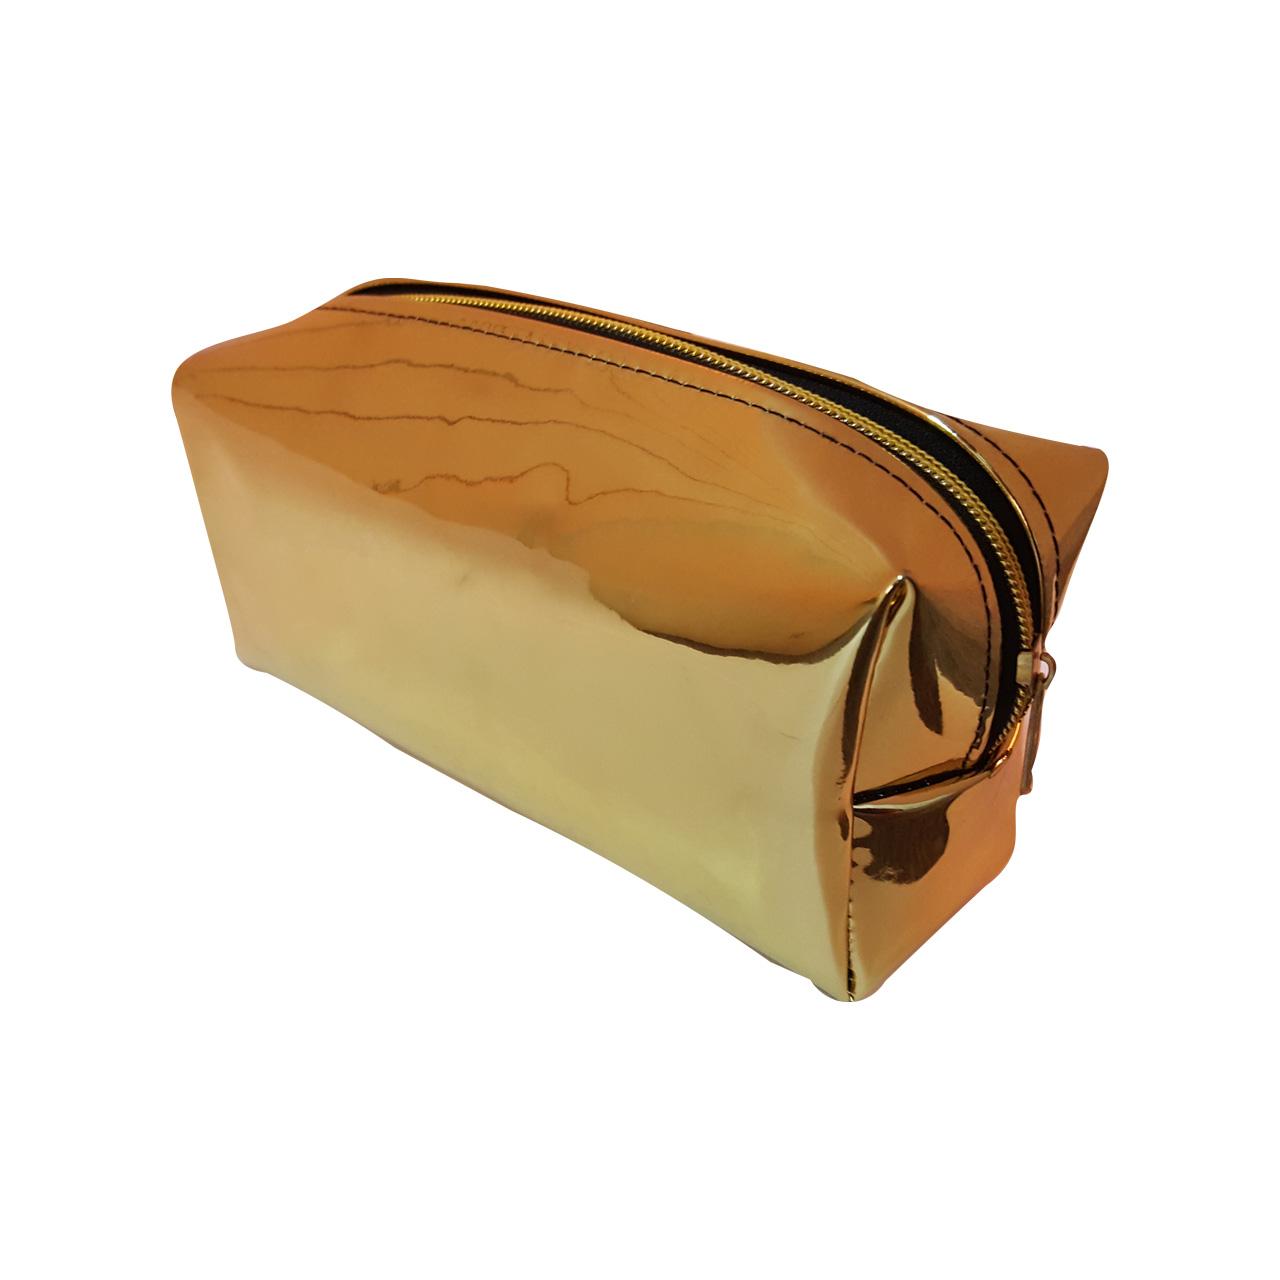 کیف  لوازم  آرایش زنانه کد U500